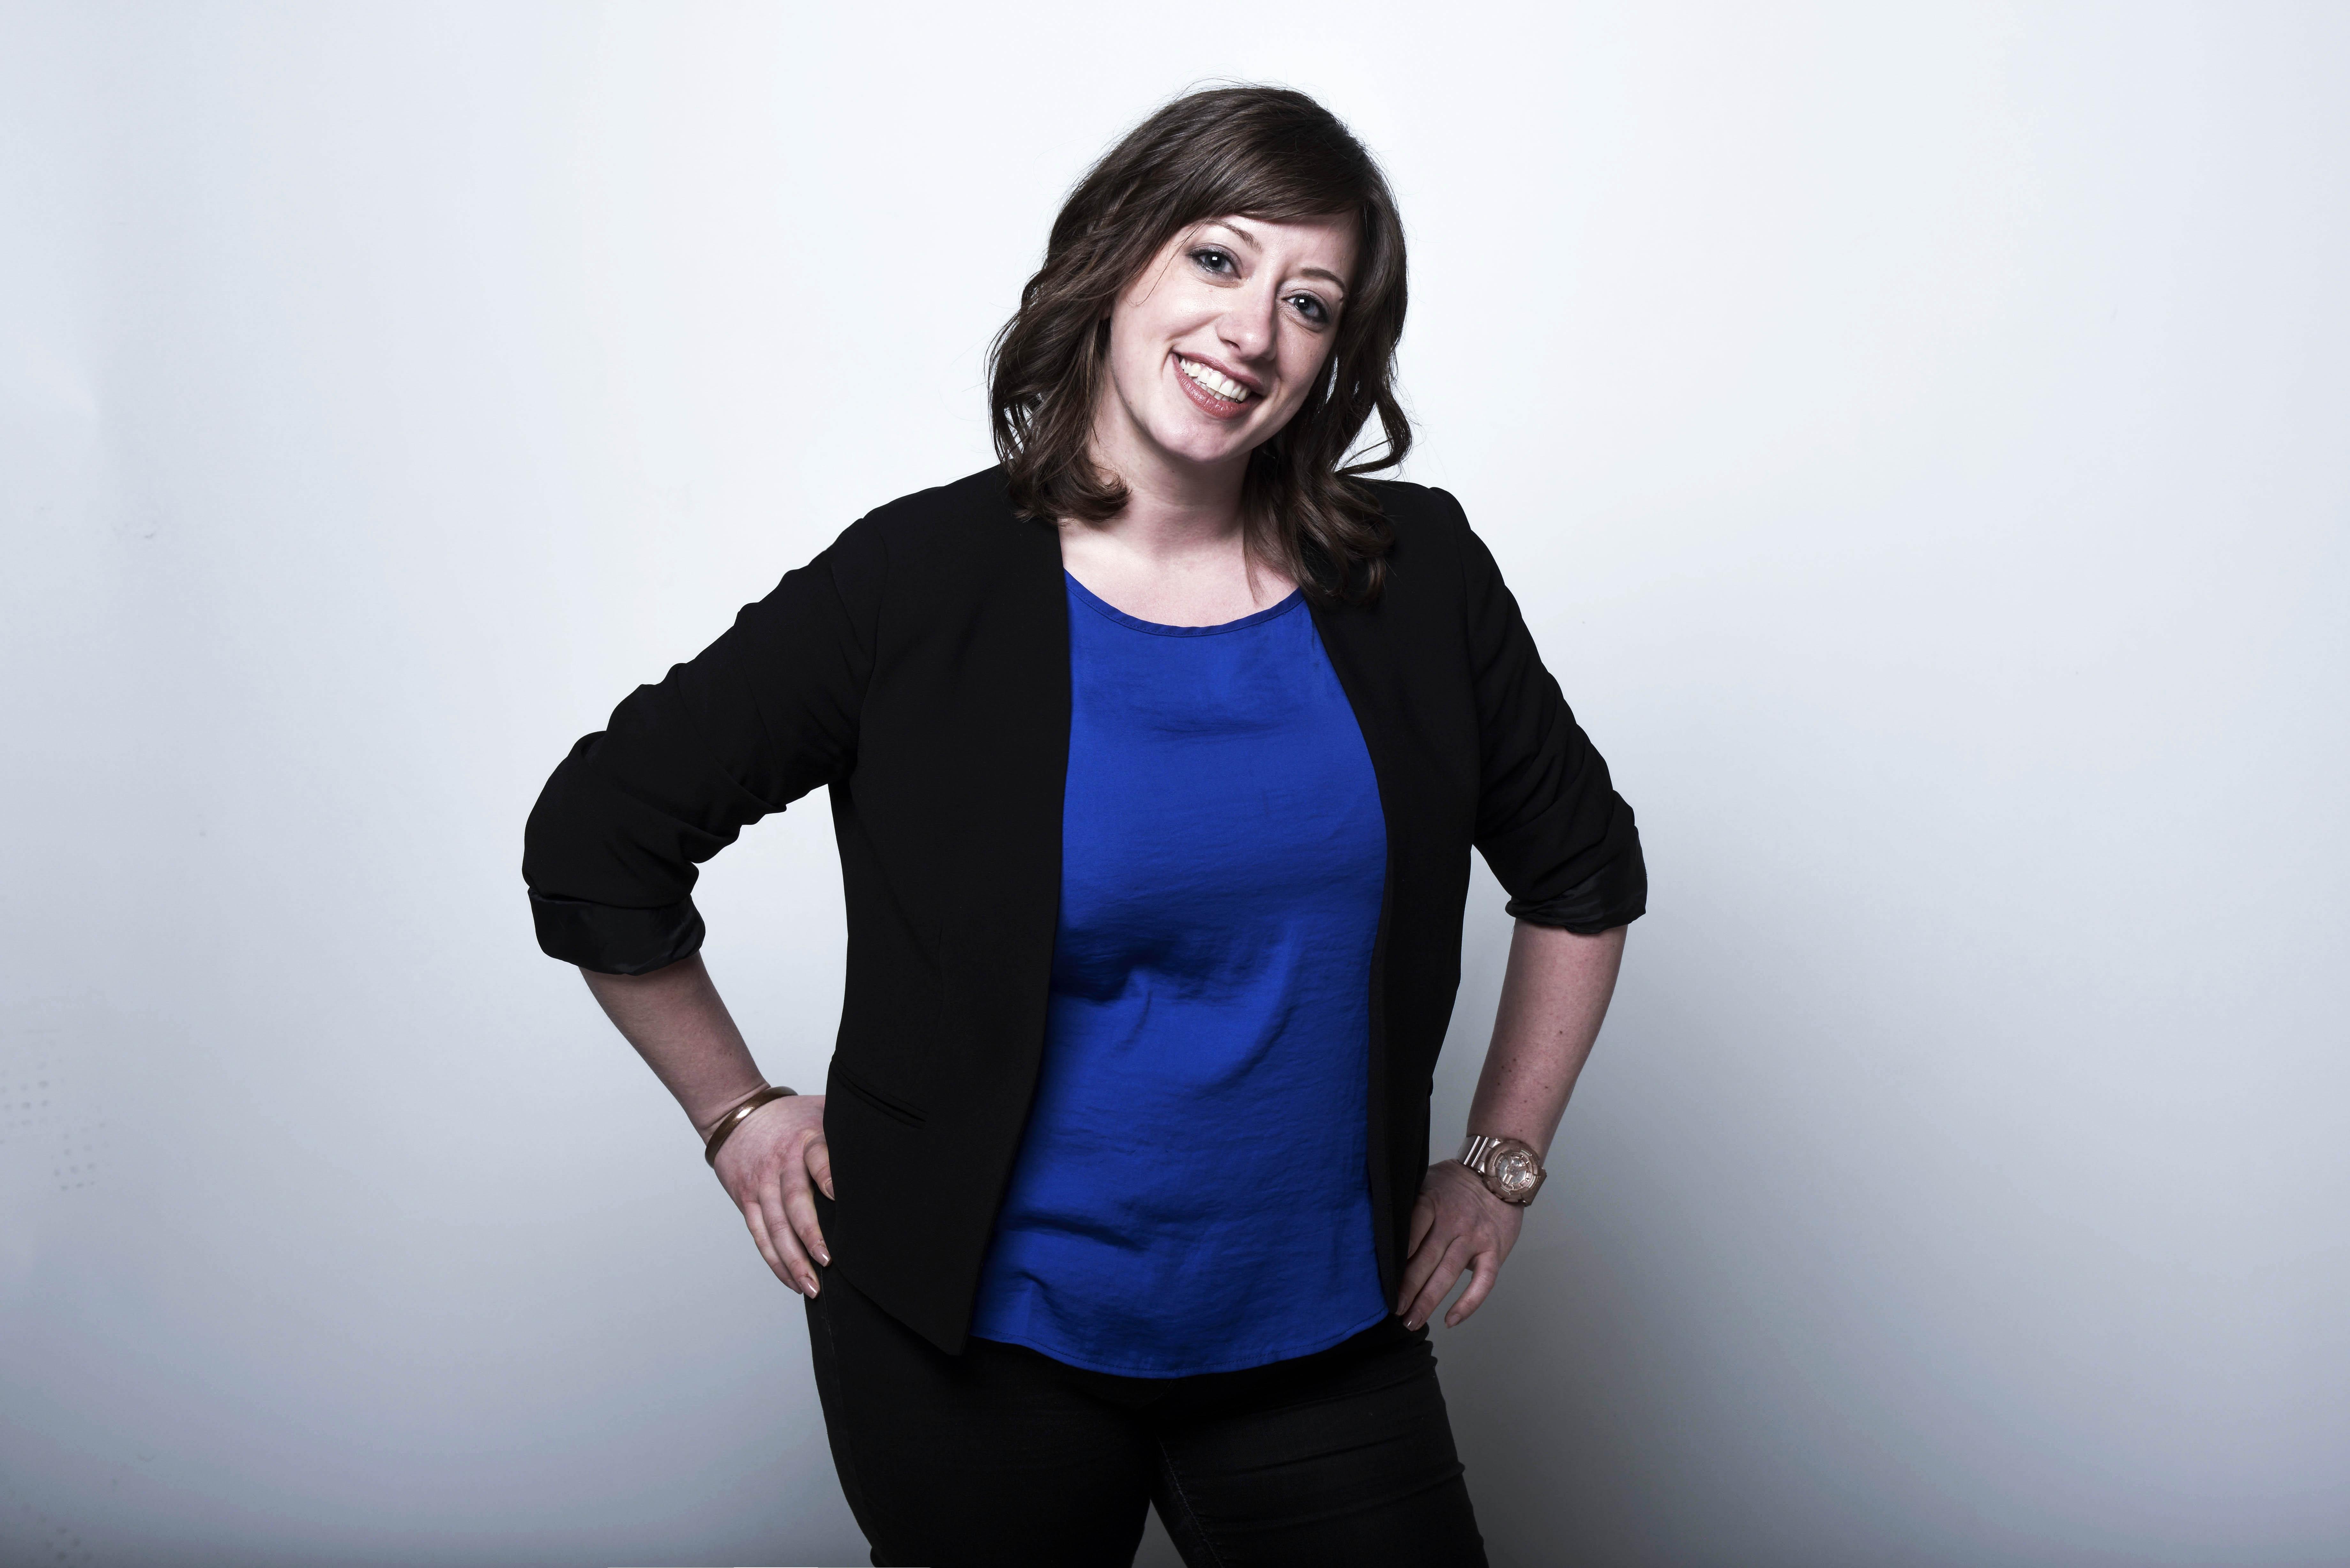 Vanessa Schulz